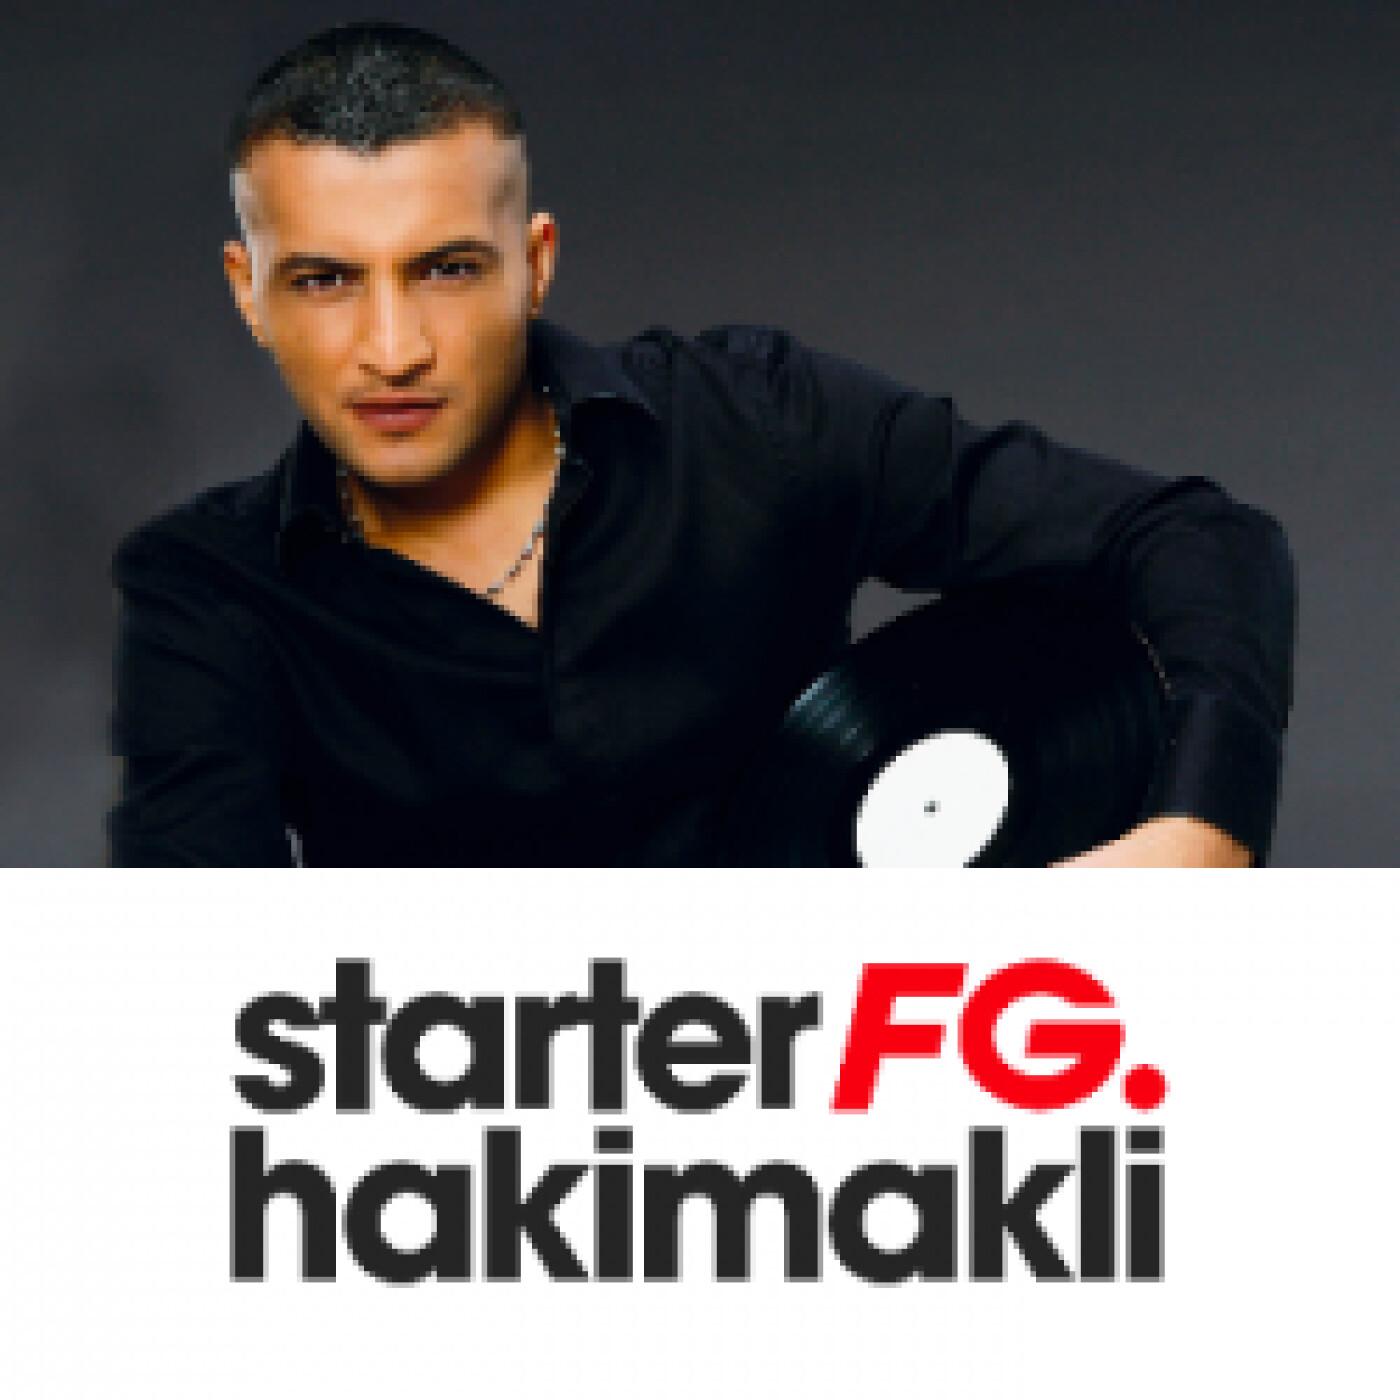 STARTER FG BY HAKIMAKLI MARDI 30 MARS 2021